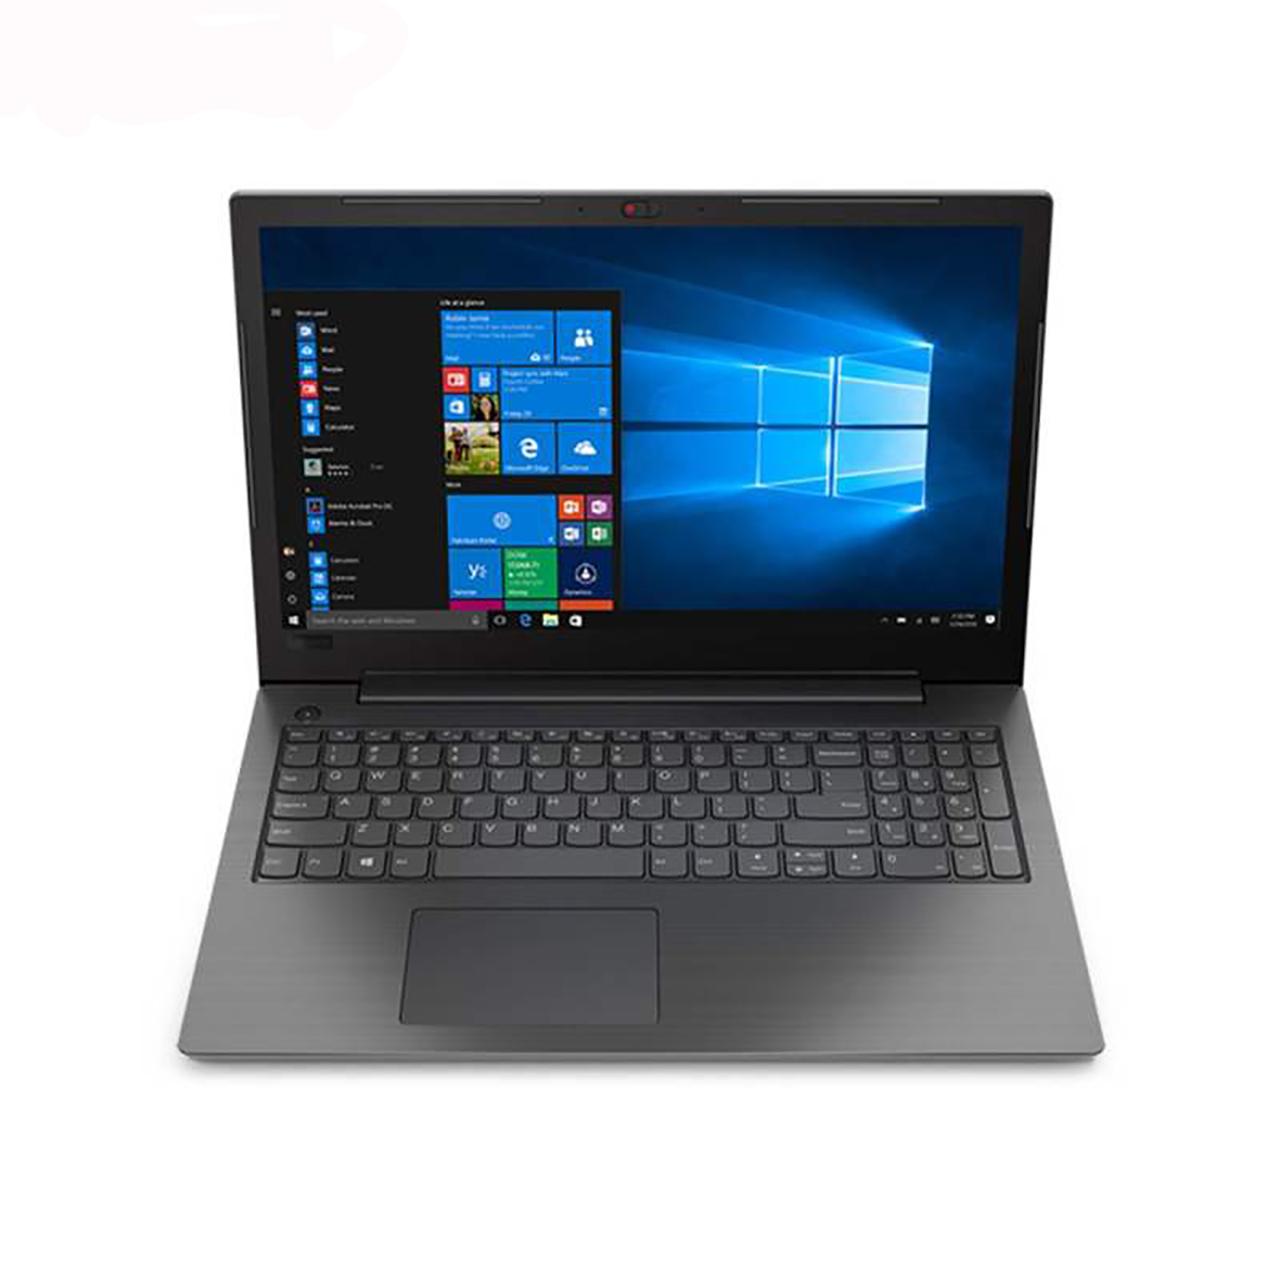 لپ تاپ 15 اینچی لنوو مدل Ideapad V130 - A